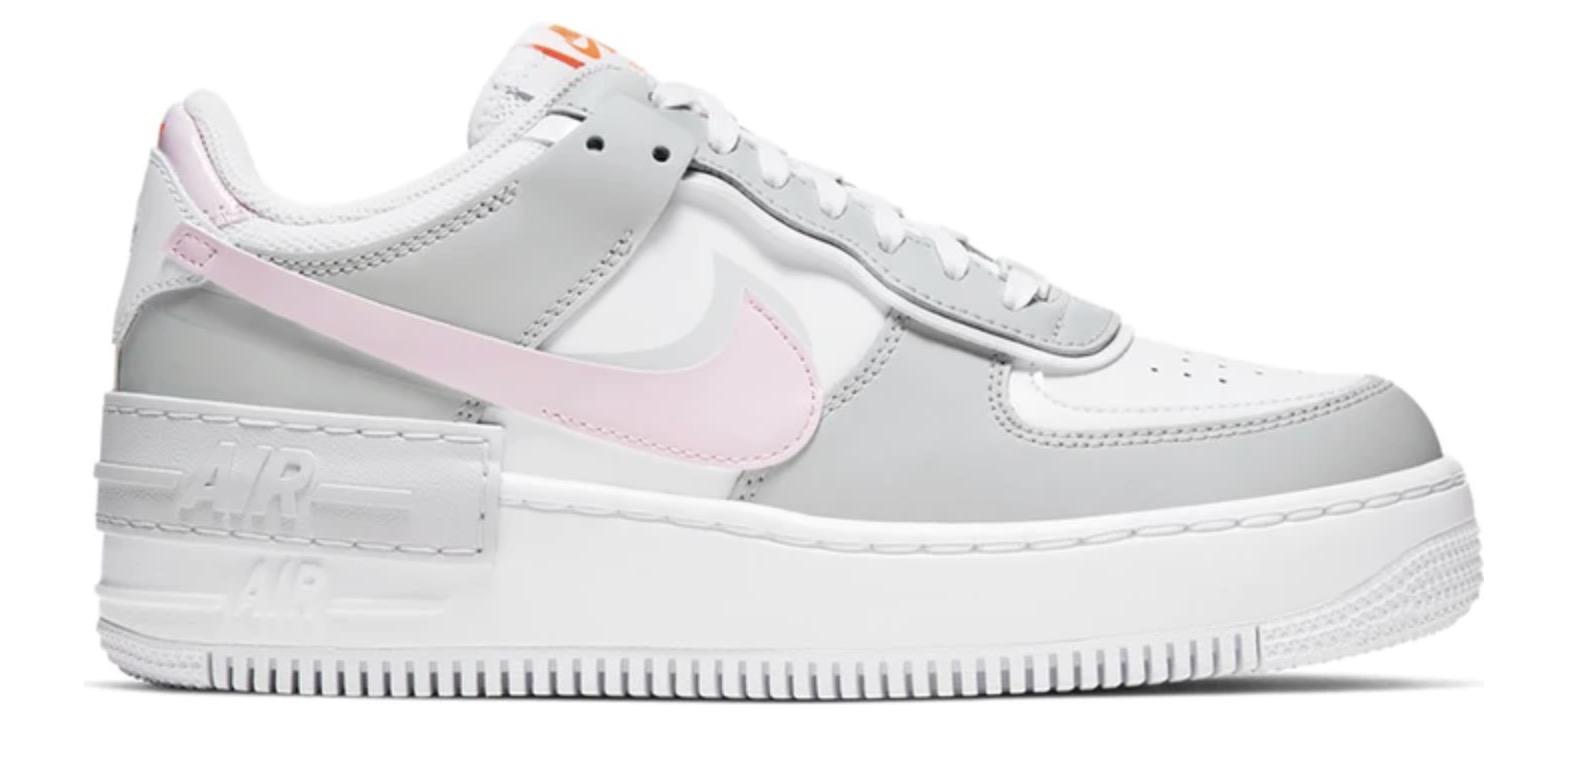 Nike Air Force 1 Shadow Grey Pink Foam